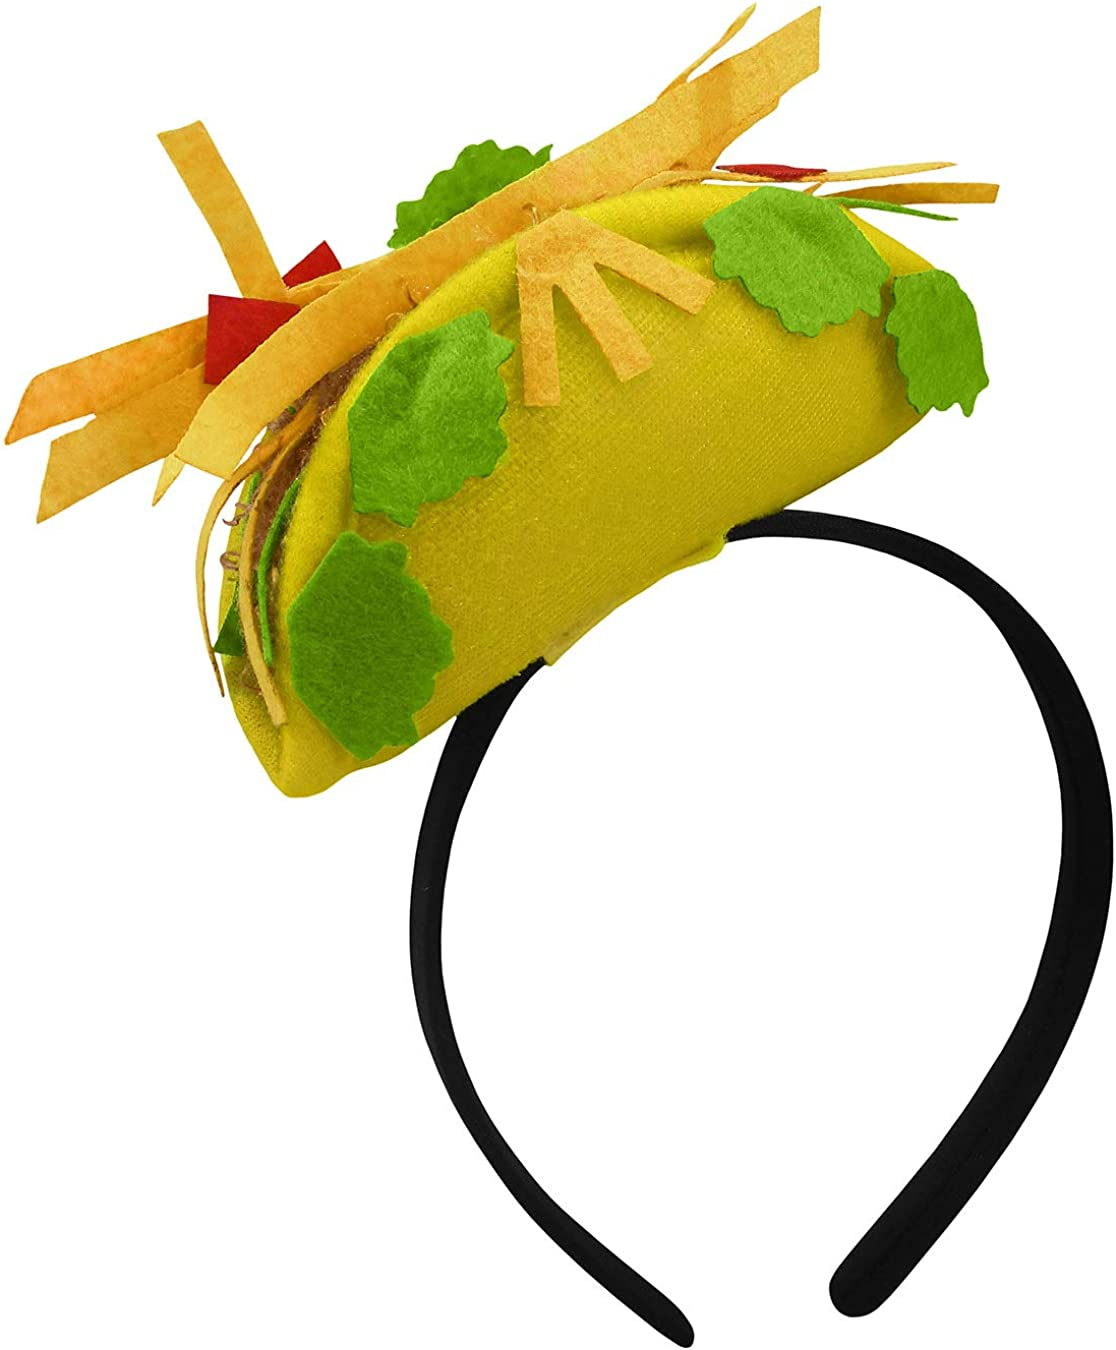 Unisex Plush Mini Food on Headband Hot Dog Hamburger Taco Vendor Party Supplies